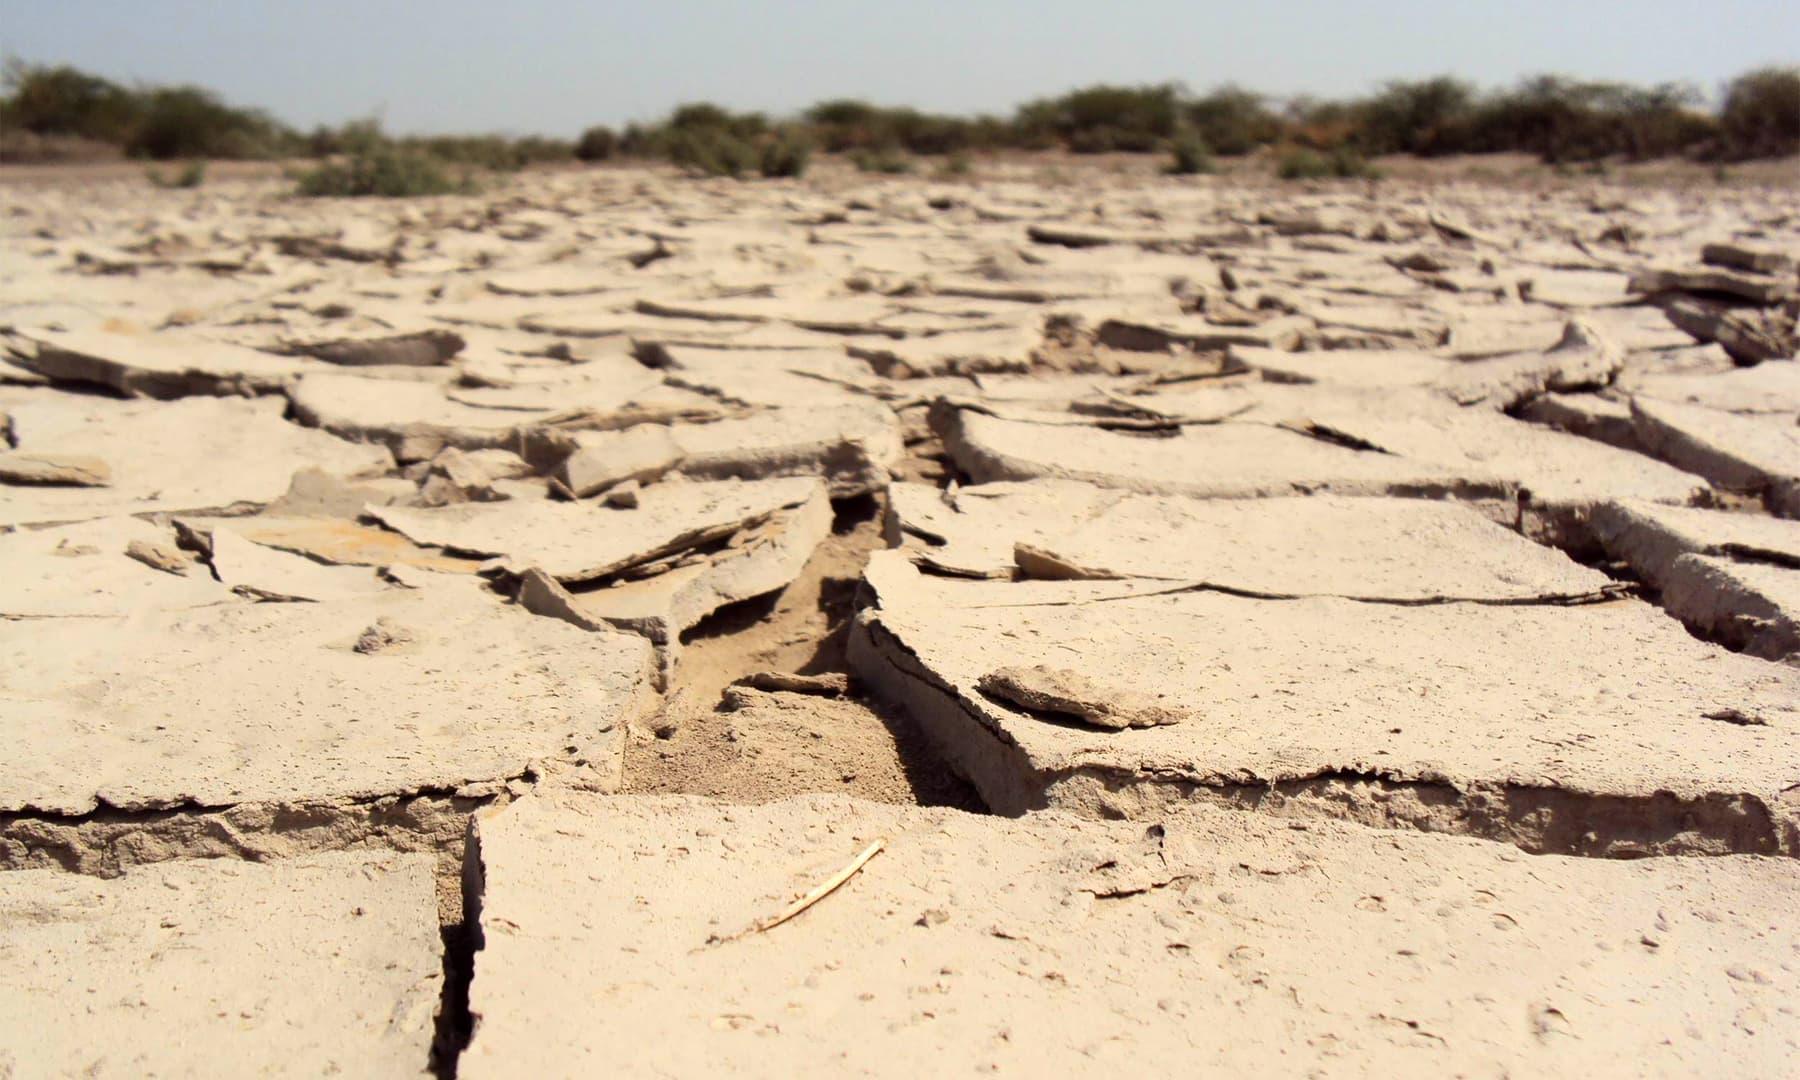 شاندار ماضی کا حامل ڈیلٹا آج بنجر زمین — تصویر ابوبکر شیخ